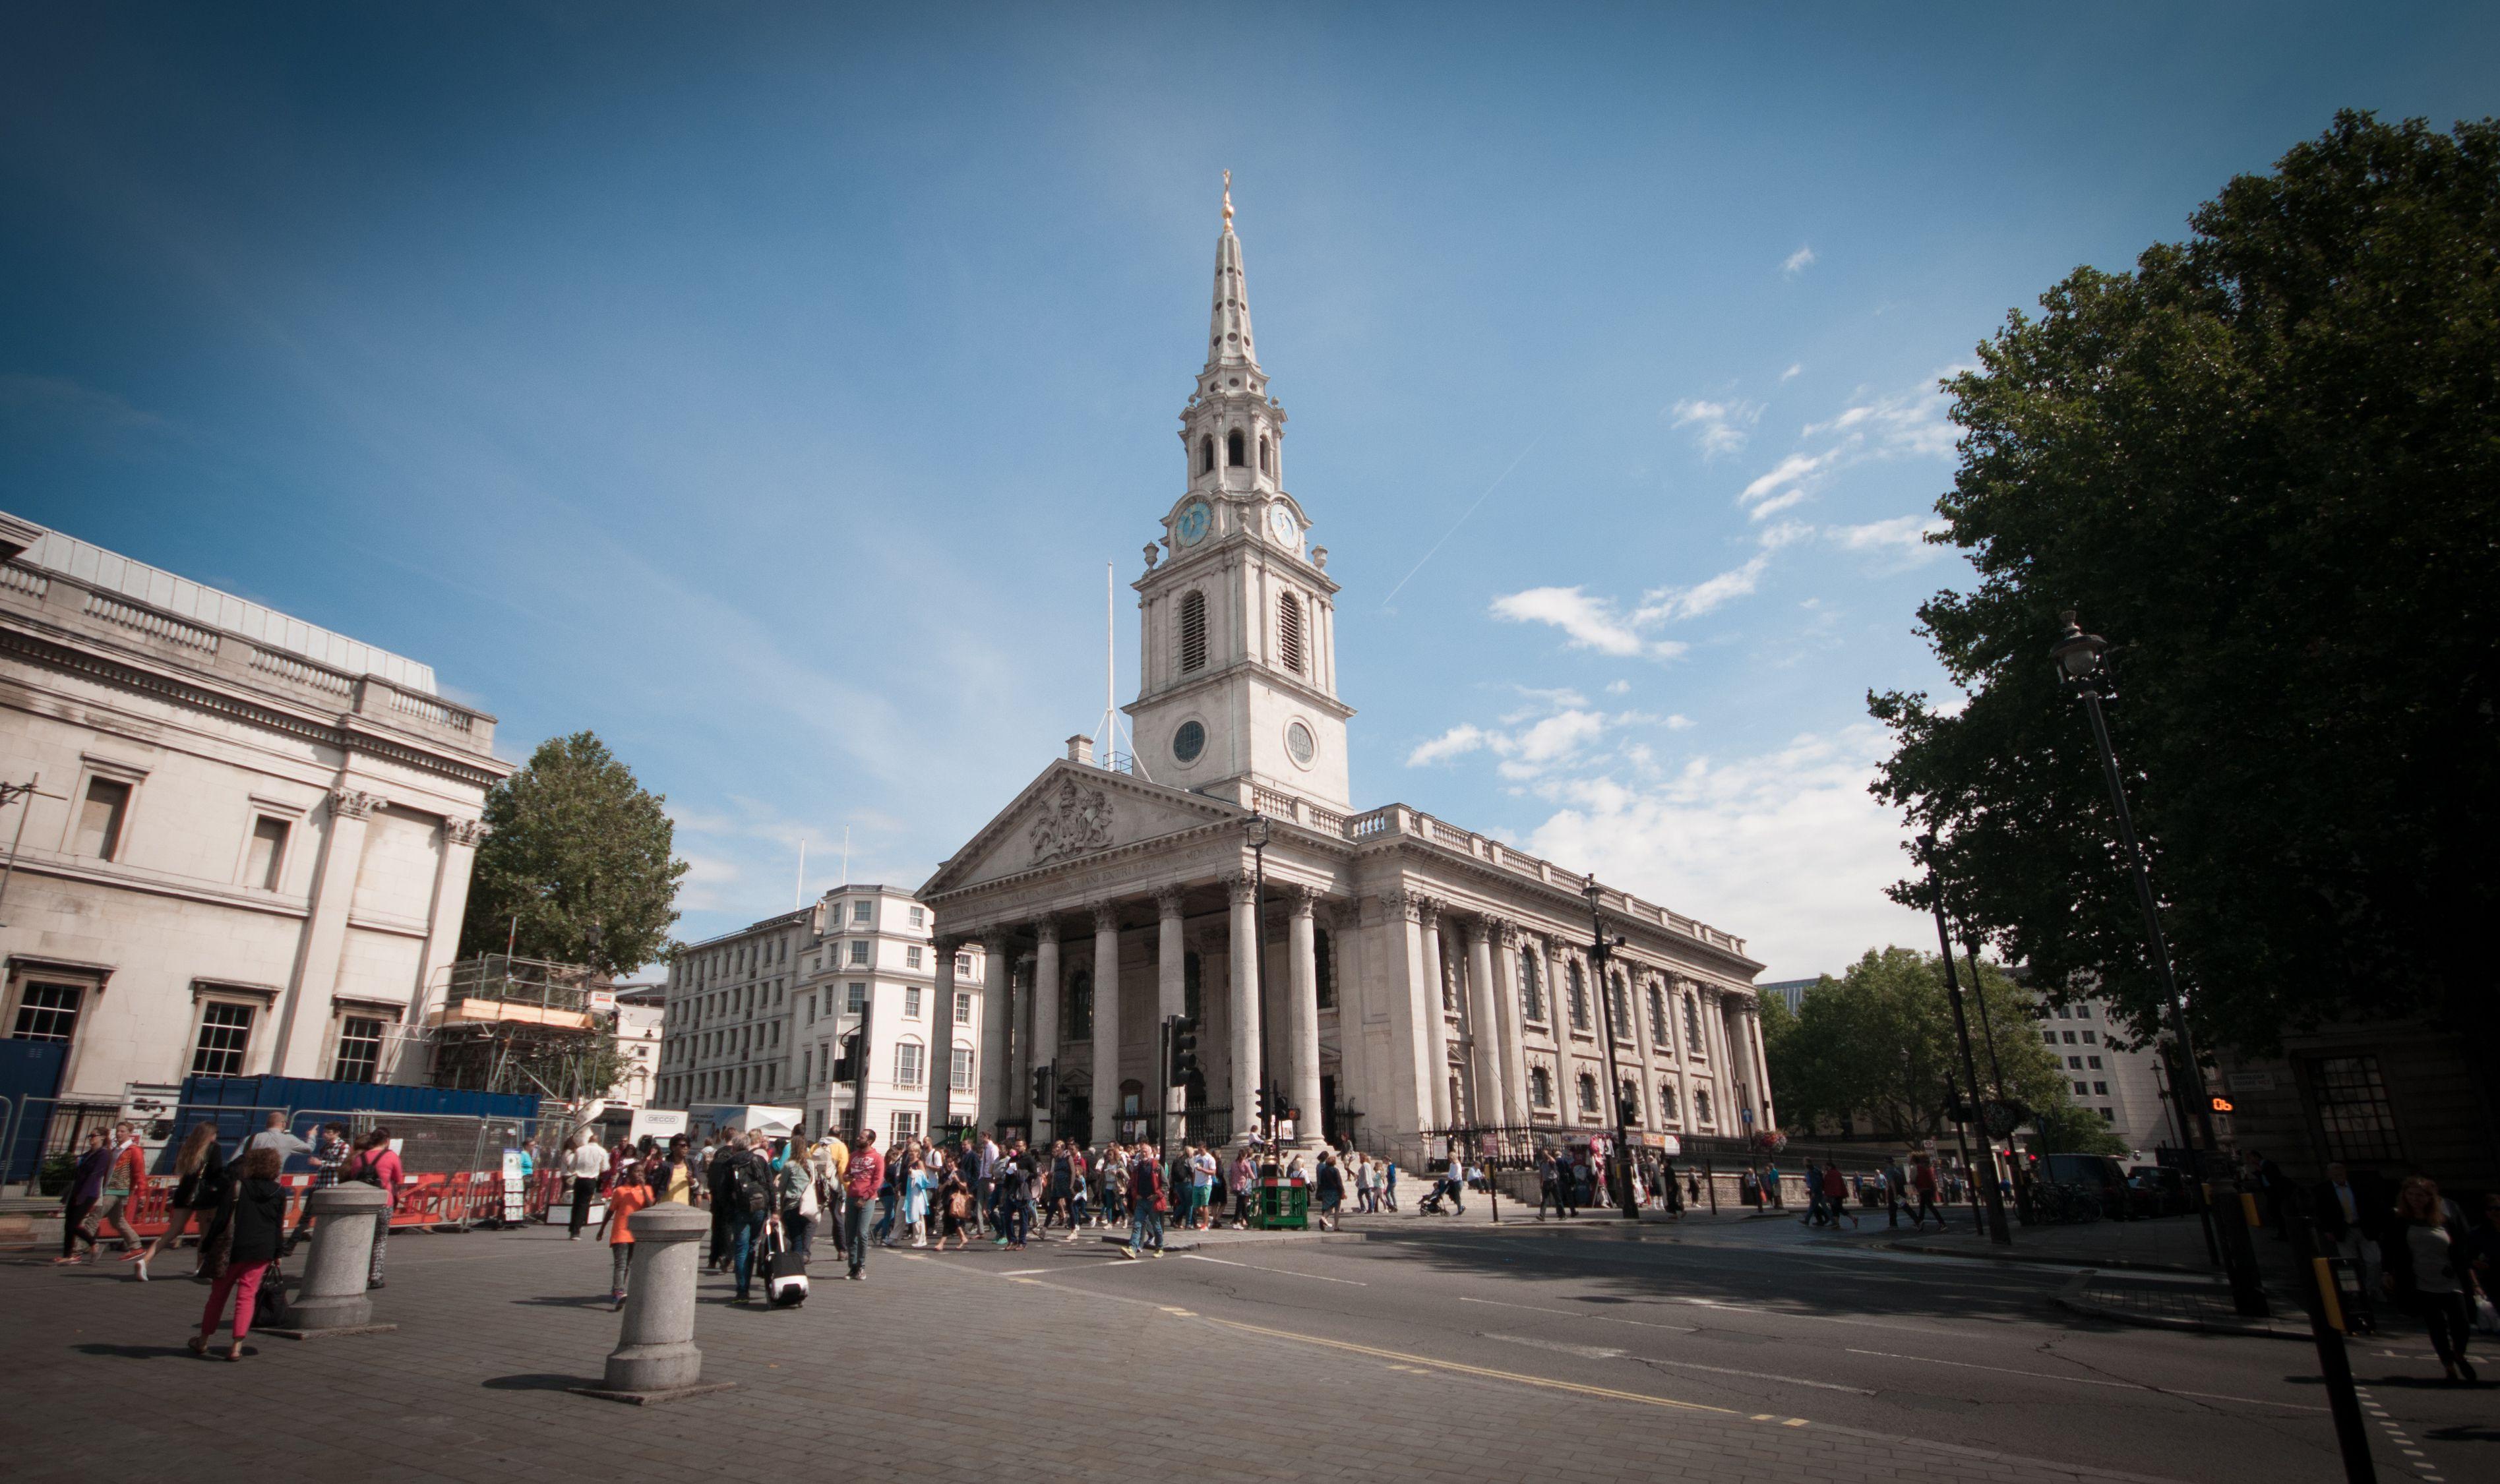 What to See a Trafalgar Square London